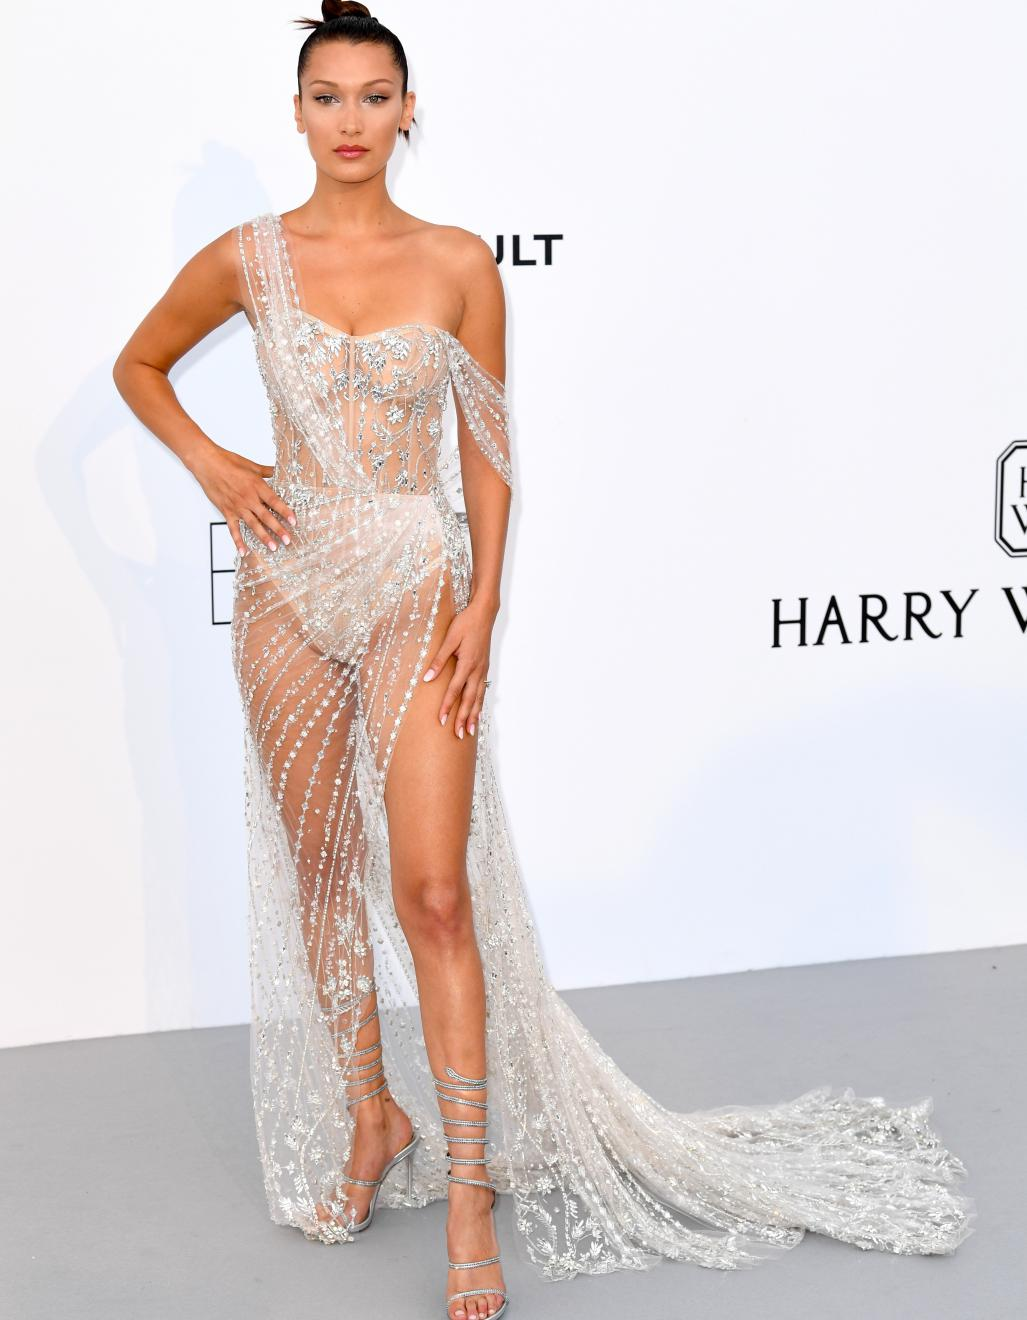 Le Look Du Jour De Cannes La Robe Transparente De Bella Hadid Elle